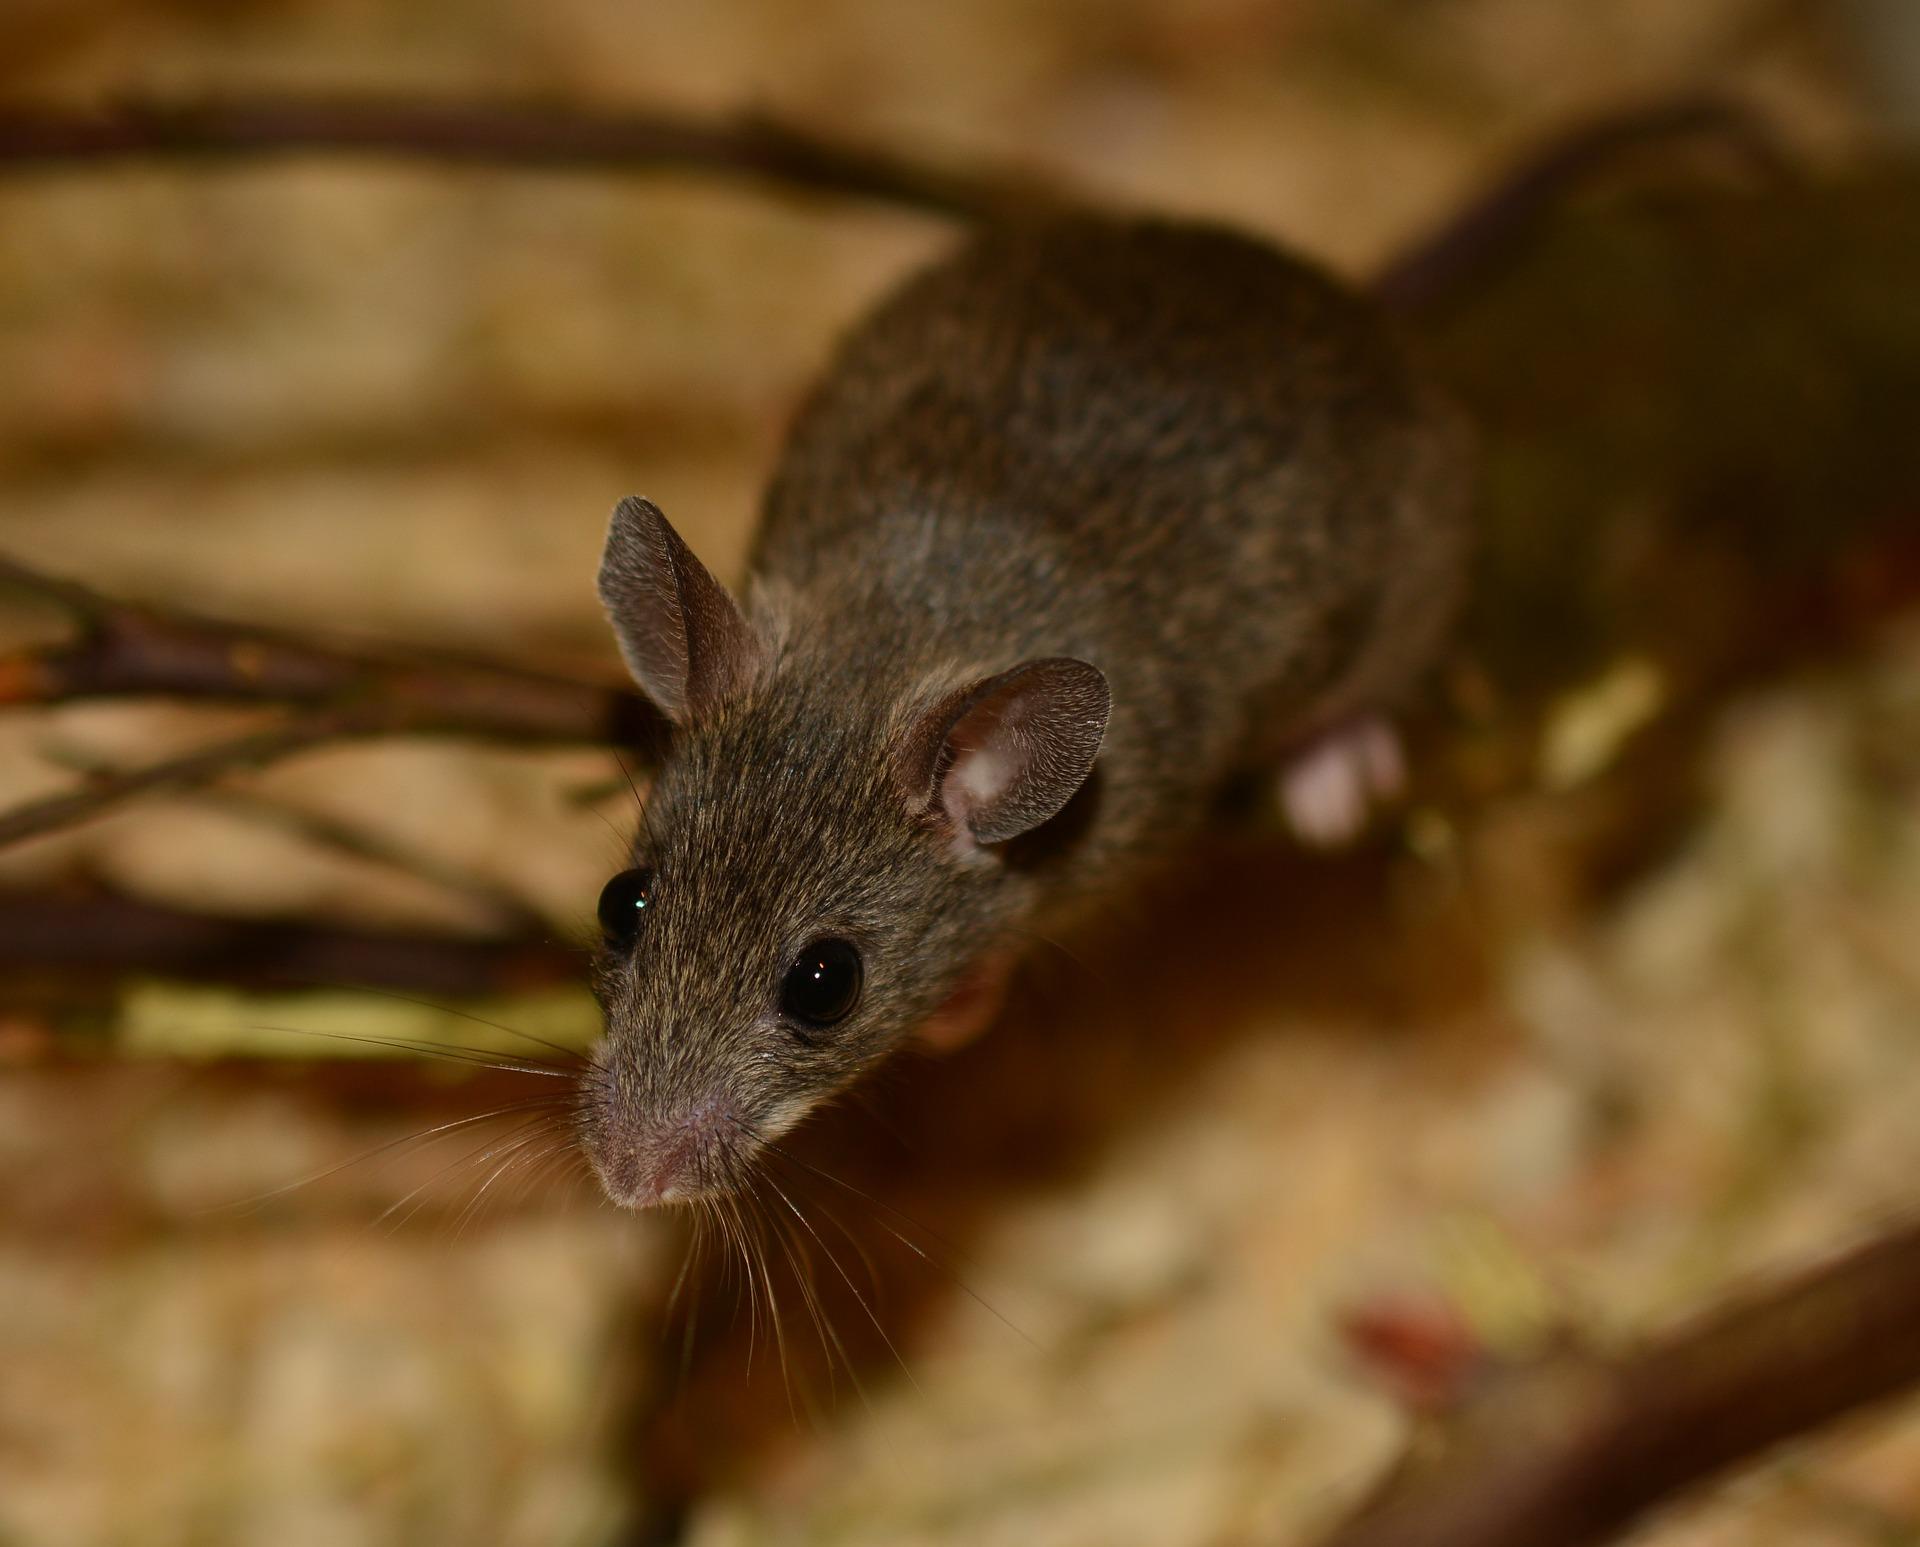 mouse-340404_1920.jpg